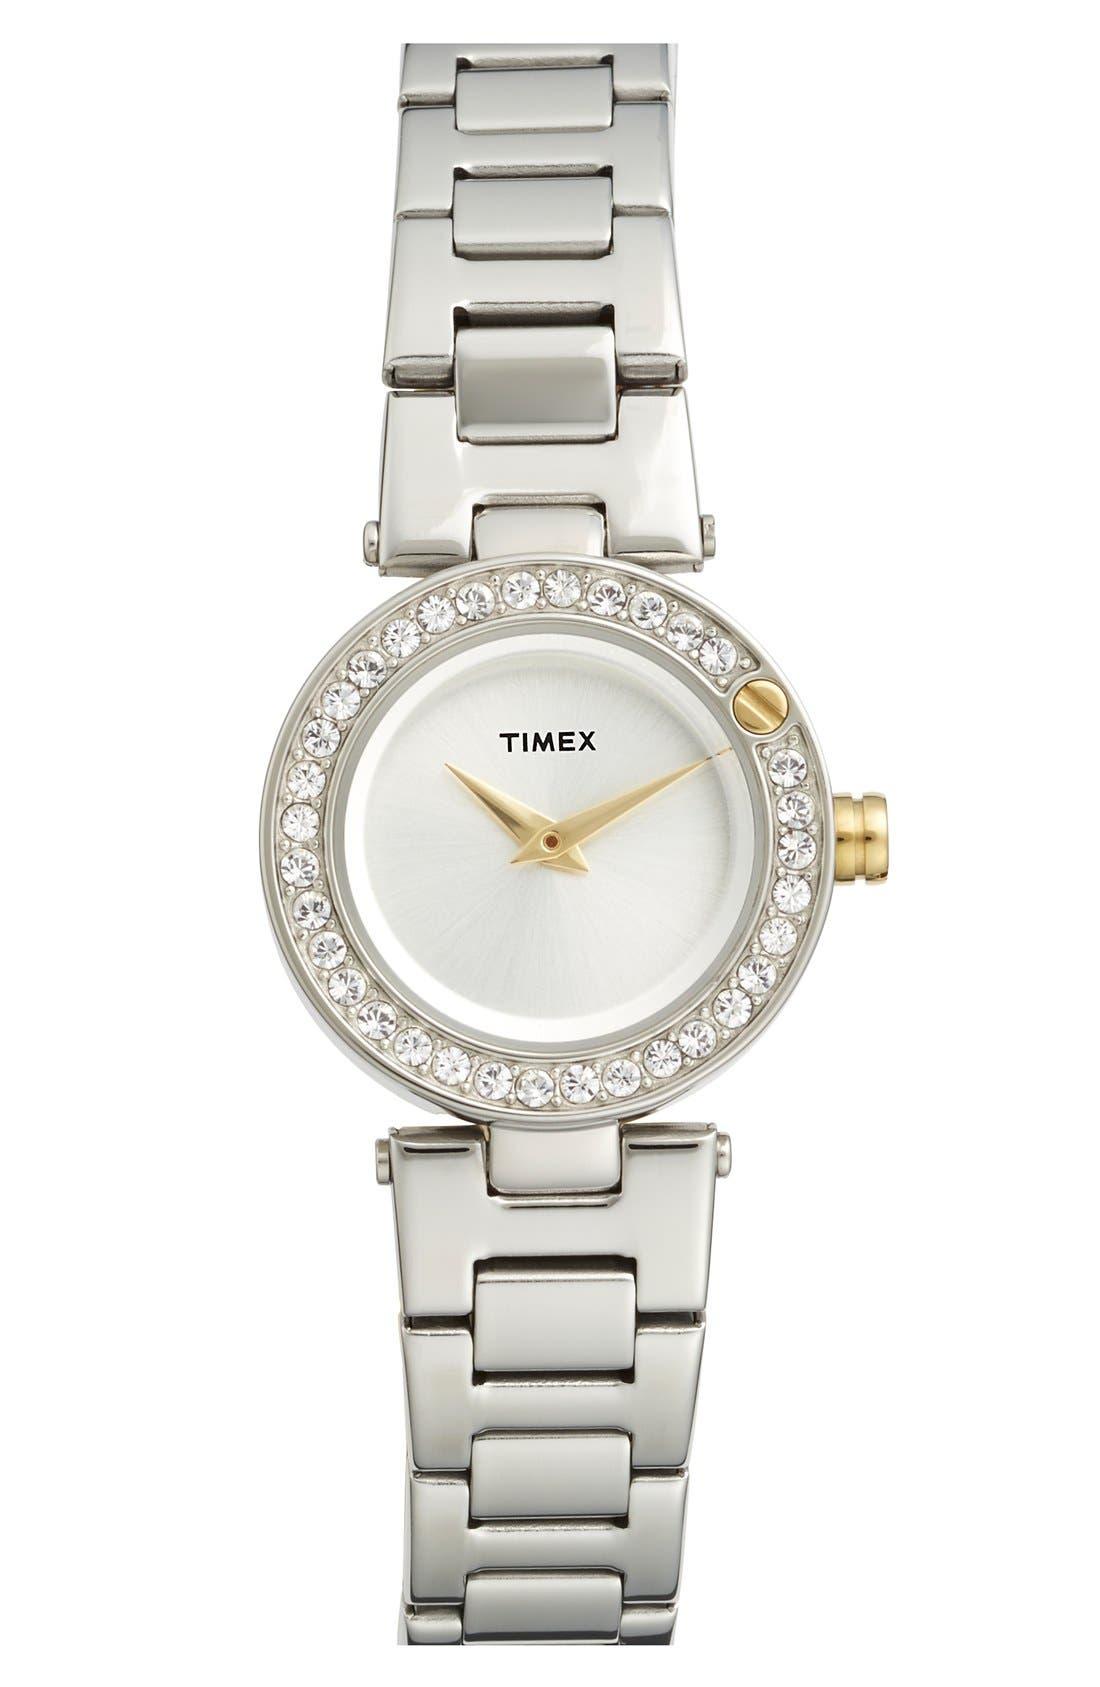 Main Image - Timex® 'Starlight' Crystal Bezel Bracelet Watch, 24mm